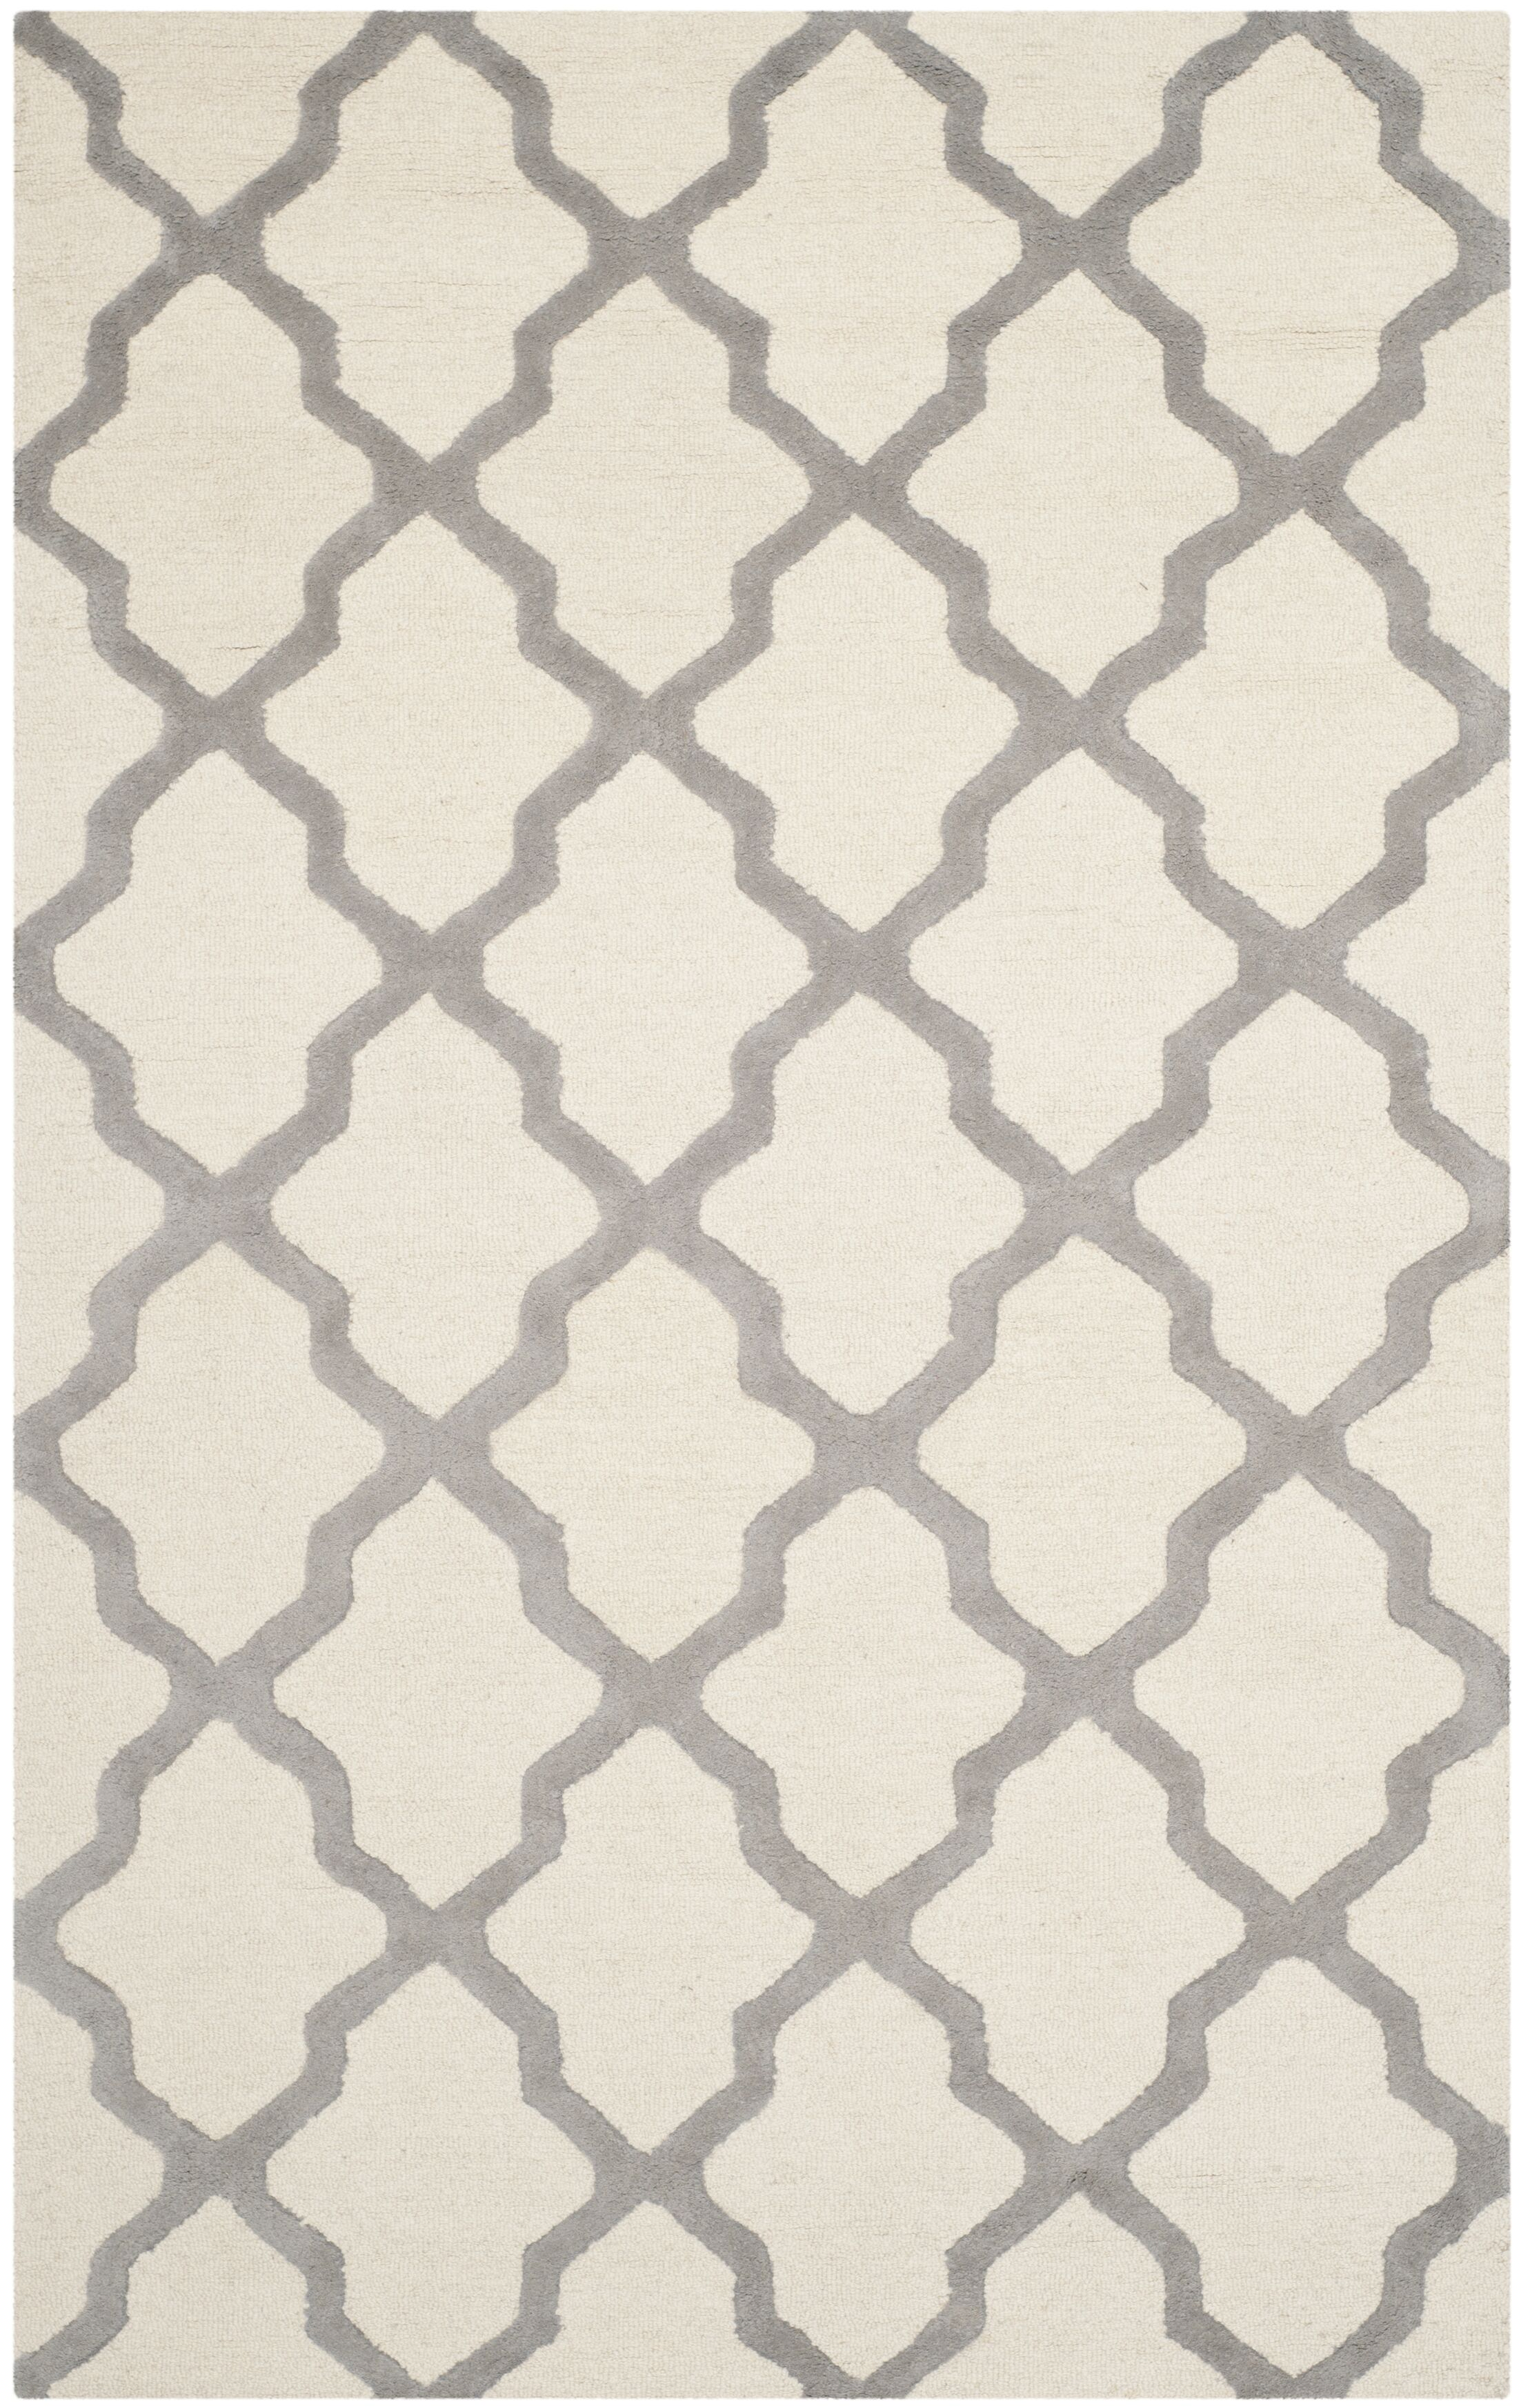 Charlenne Hand-Tufted Ivory Area Rug Rug Size: Rectangle 12' x 18'